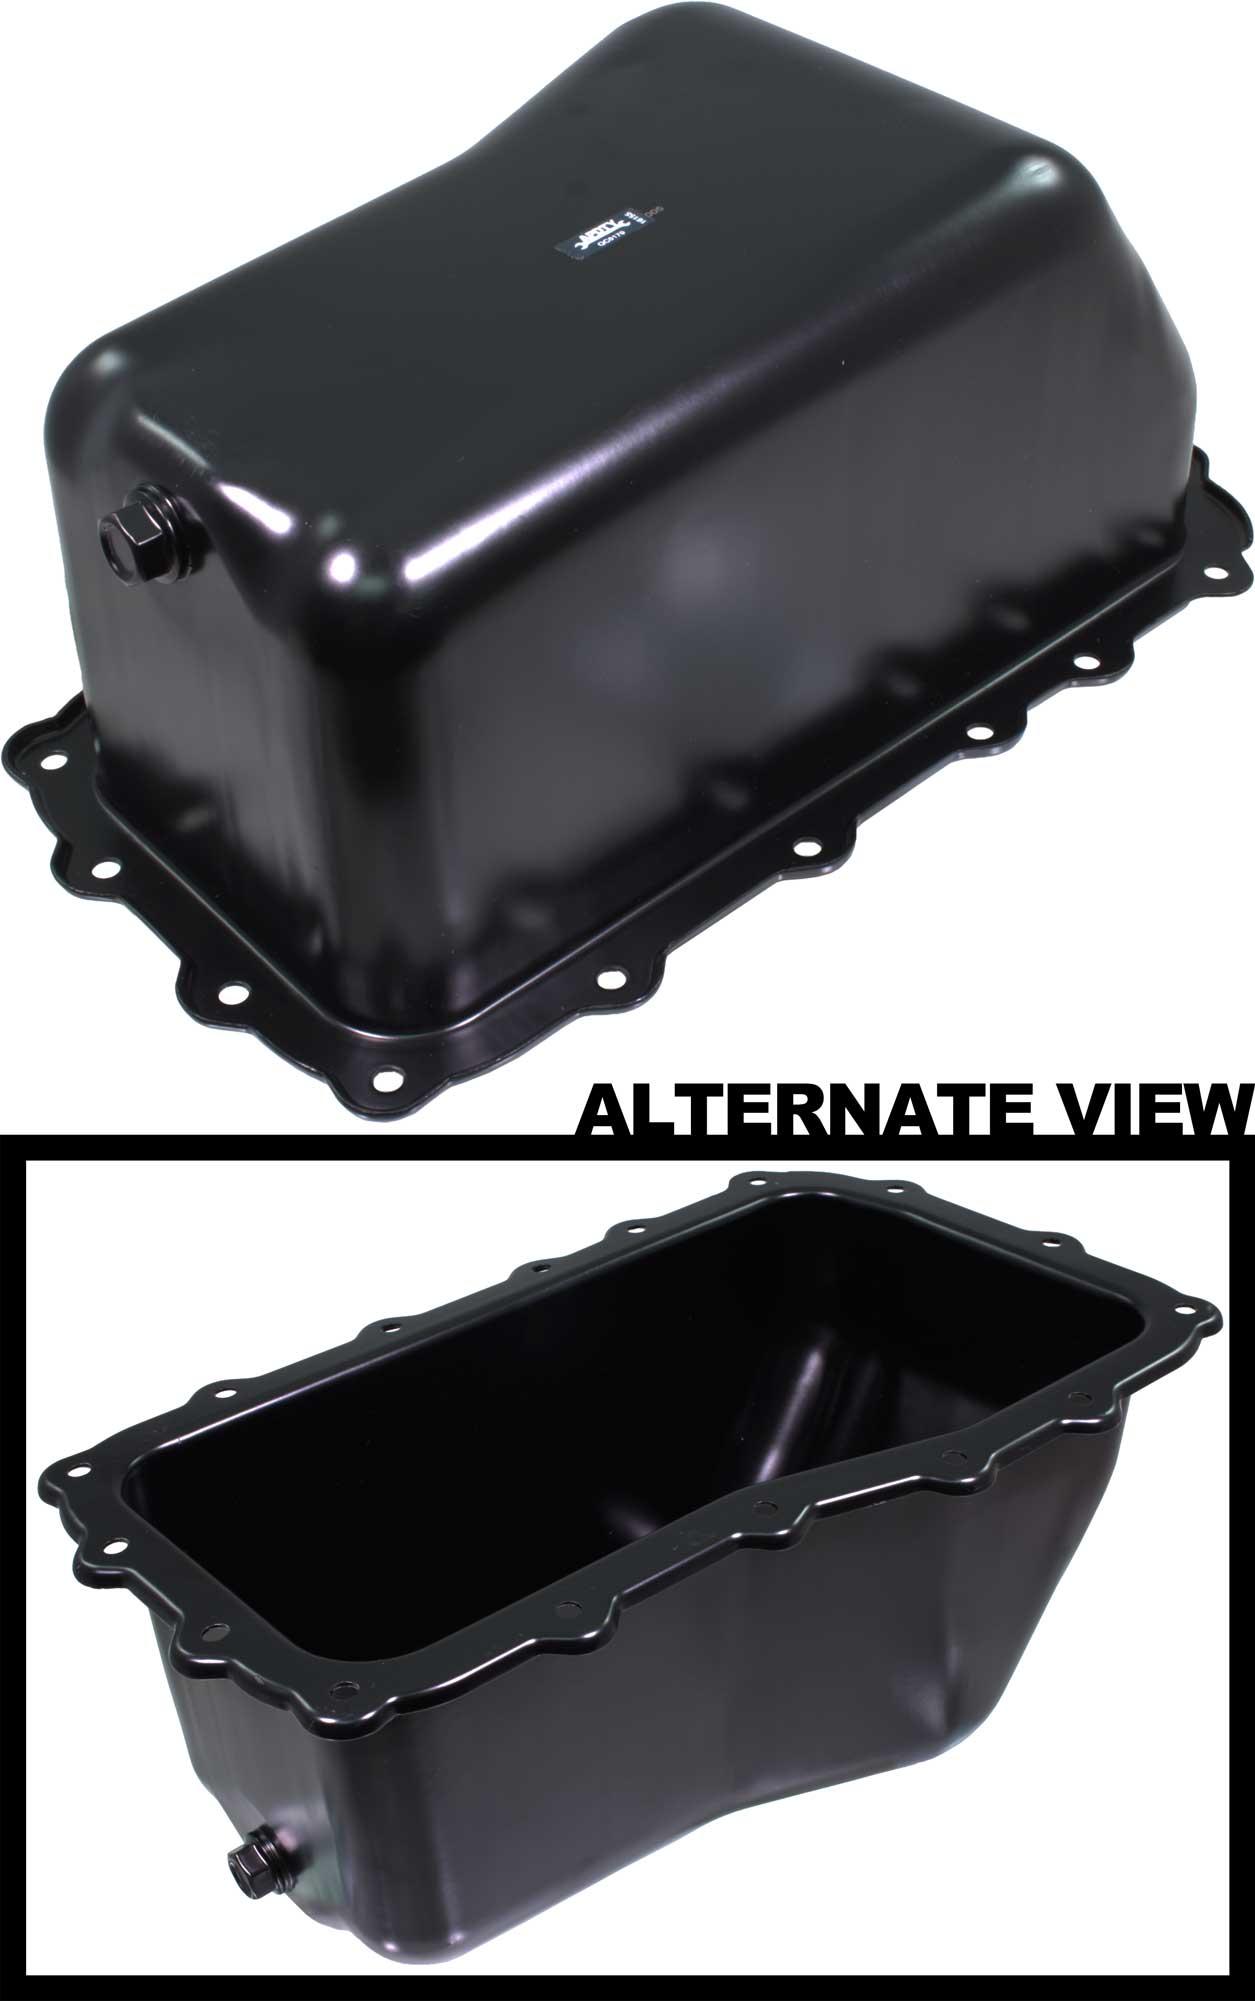 A-Premium Engine Oil Pan for Jeep Wrangler 2007 2008 2009 2010 2011 V6 3.8L